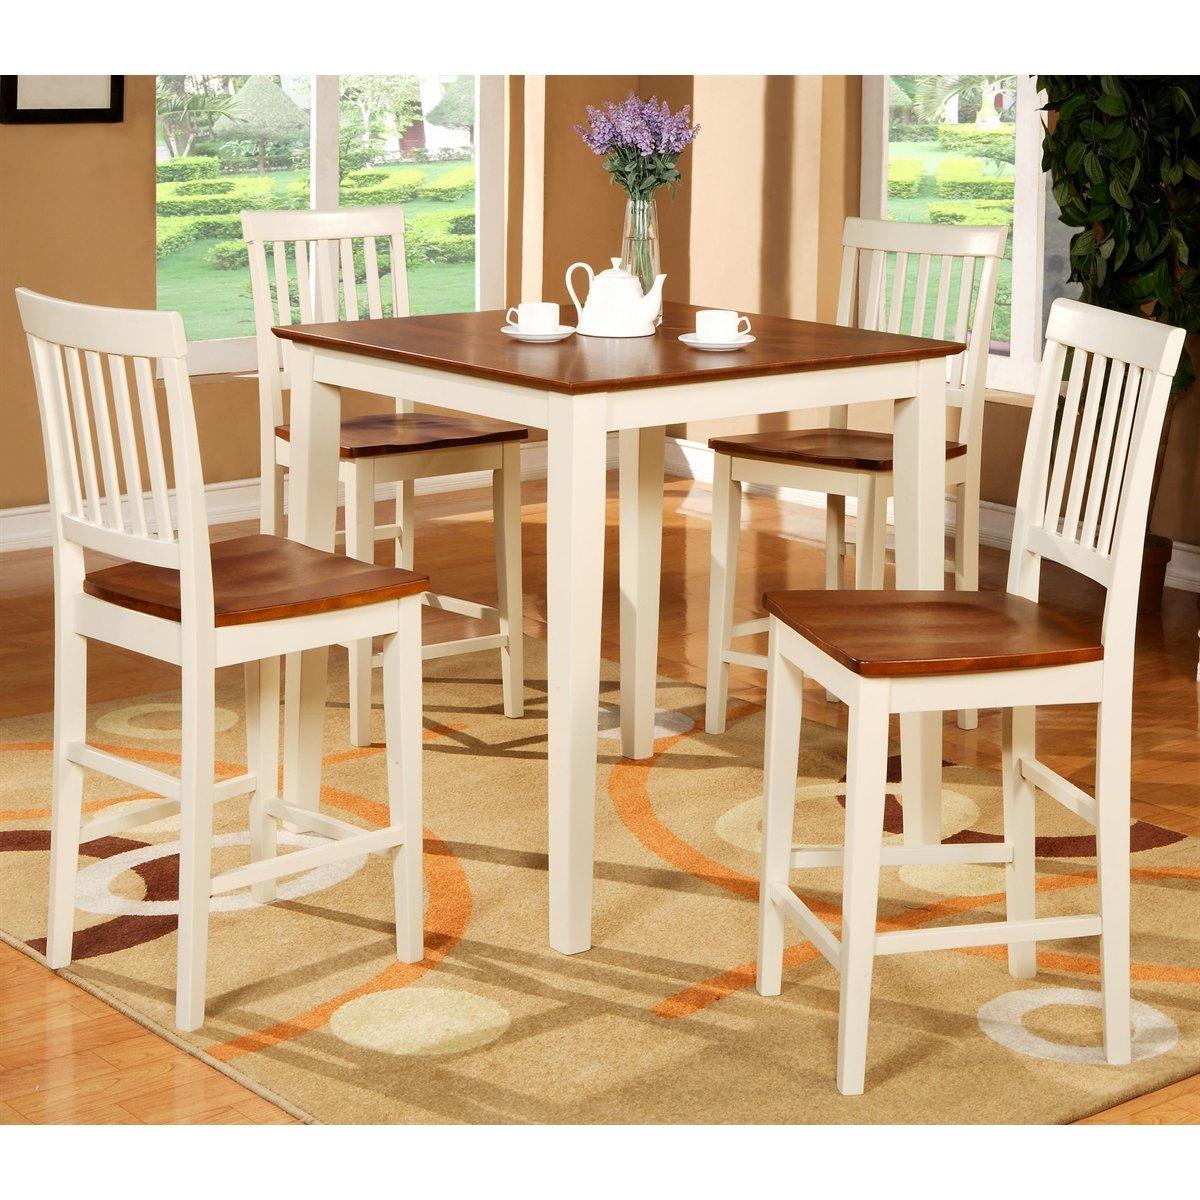 5PC Square Pub Counter Height Table Set 4 Stools White